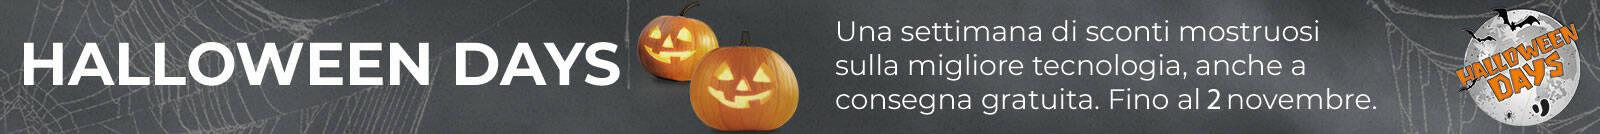 Unieuro Halloween